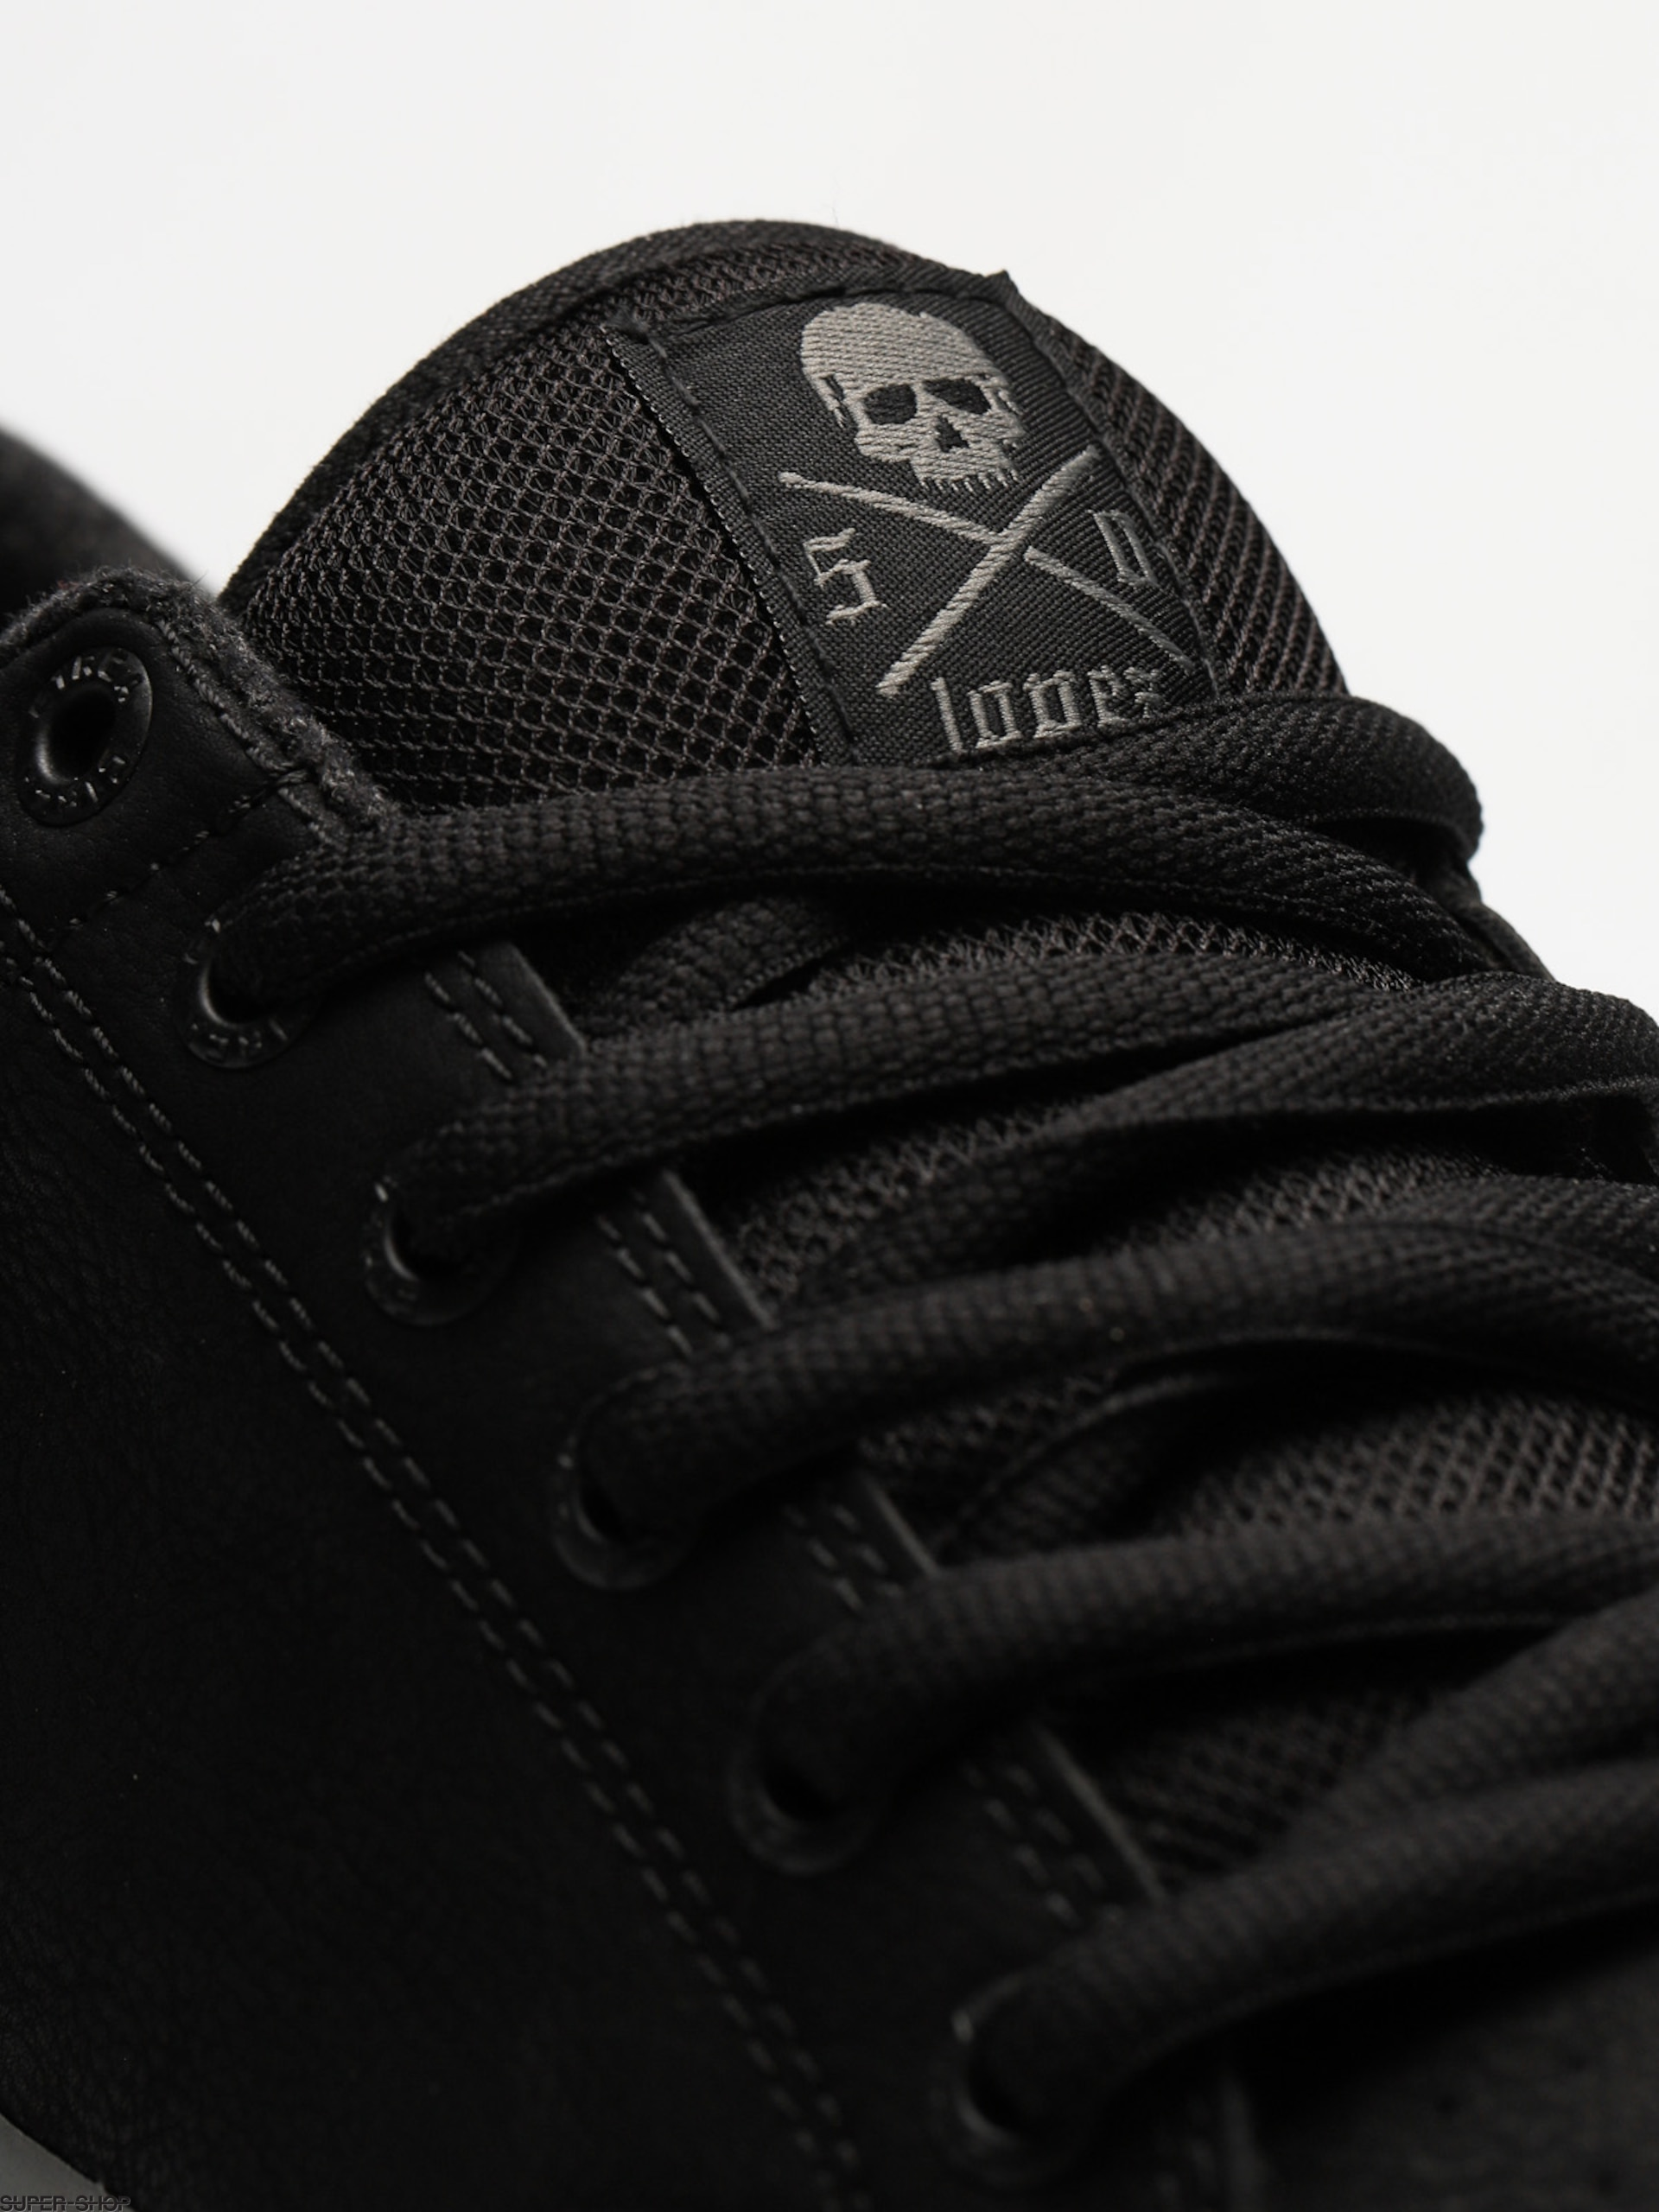 6c8f886edf Circa Shoes Lopez 50 (black pewter)